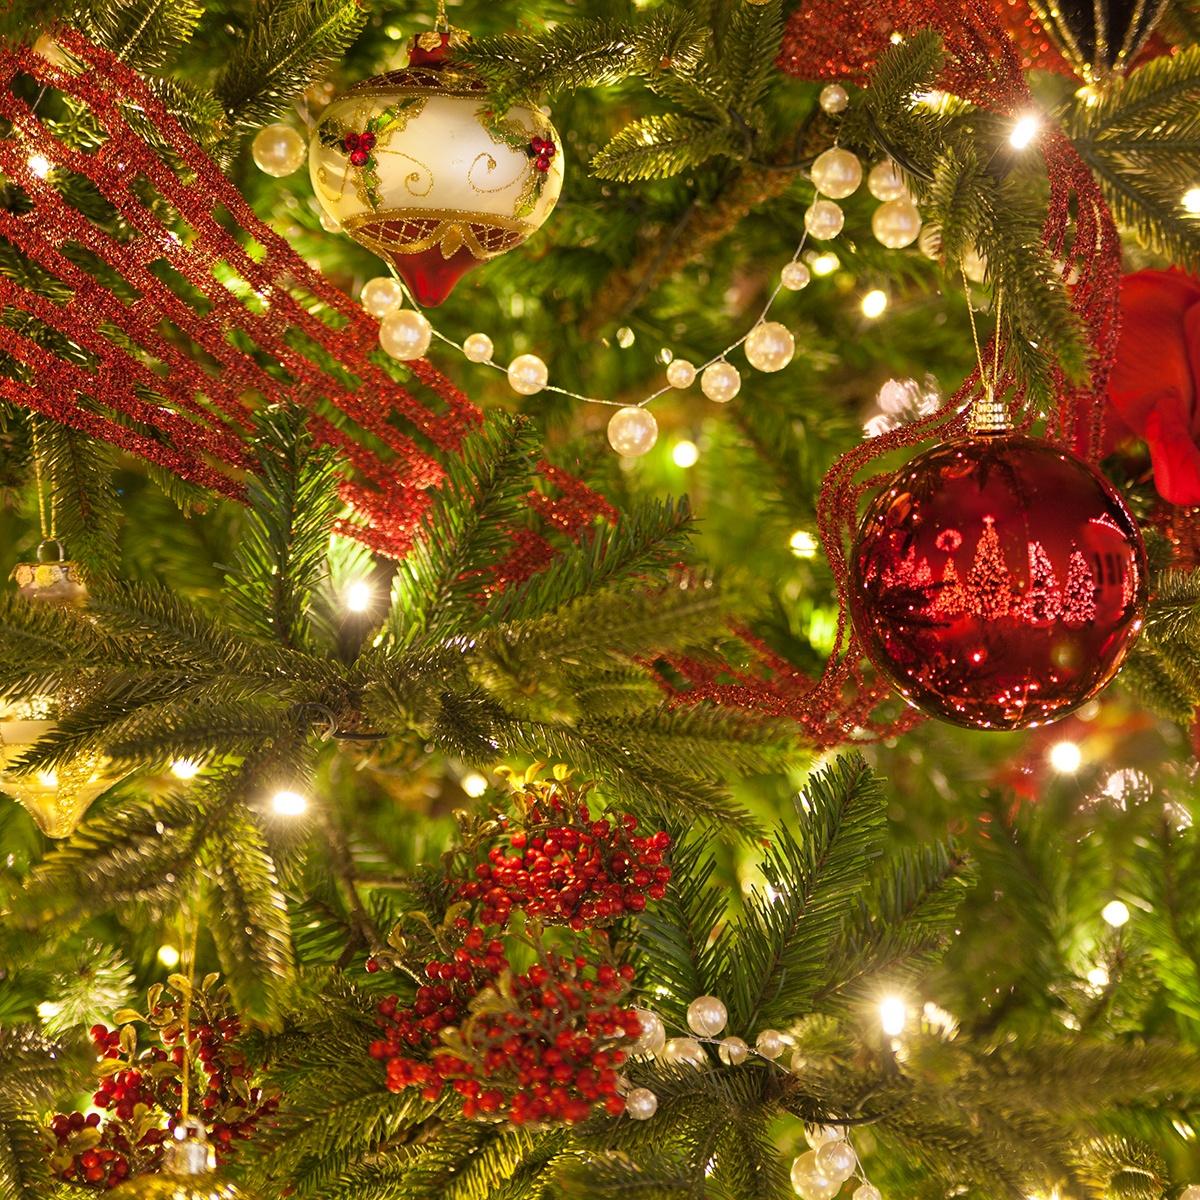 Prelit Christmas Trees Guide